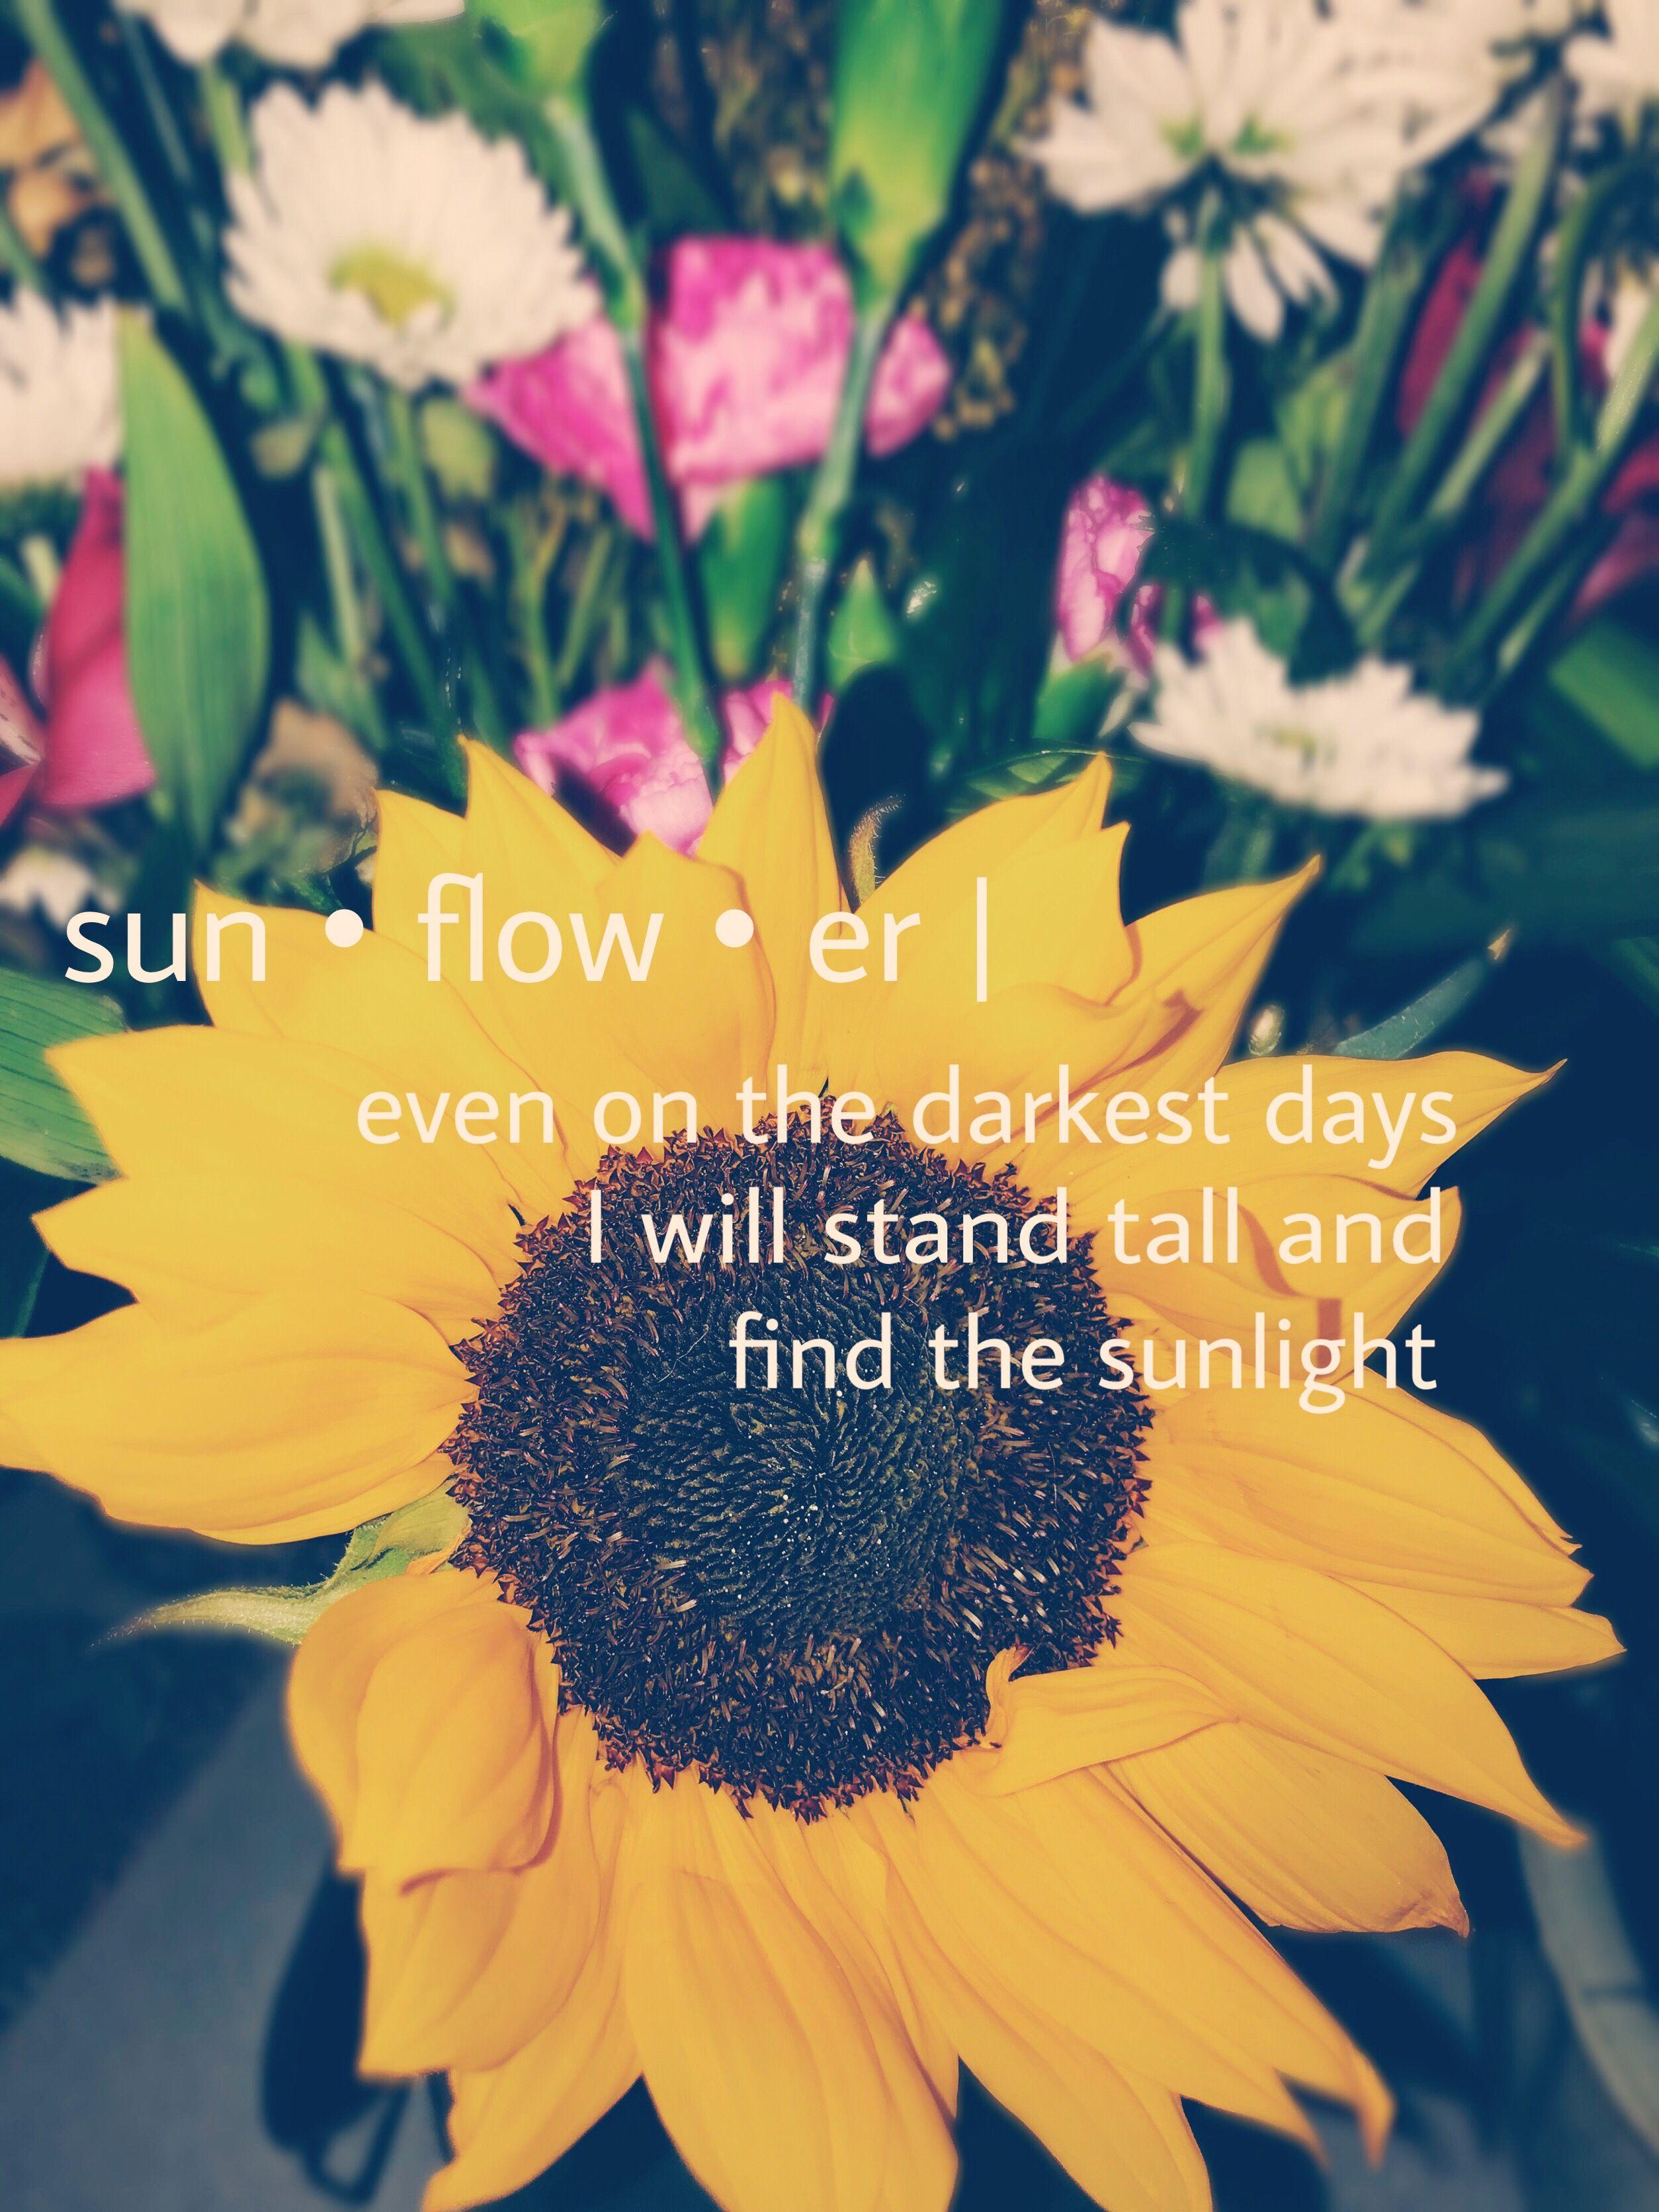 sunflower quotes 🌻  Sunflower quotes, Flower quotes, Cute quotes